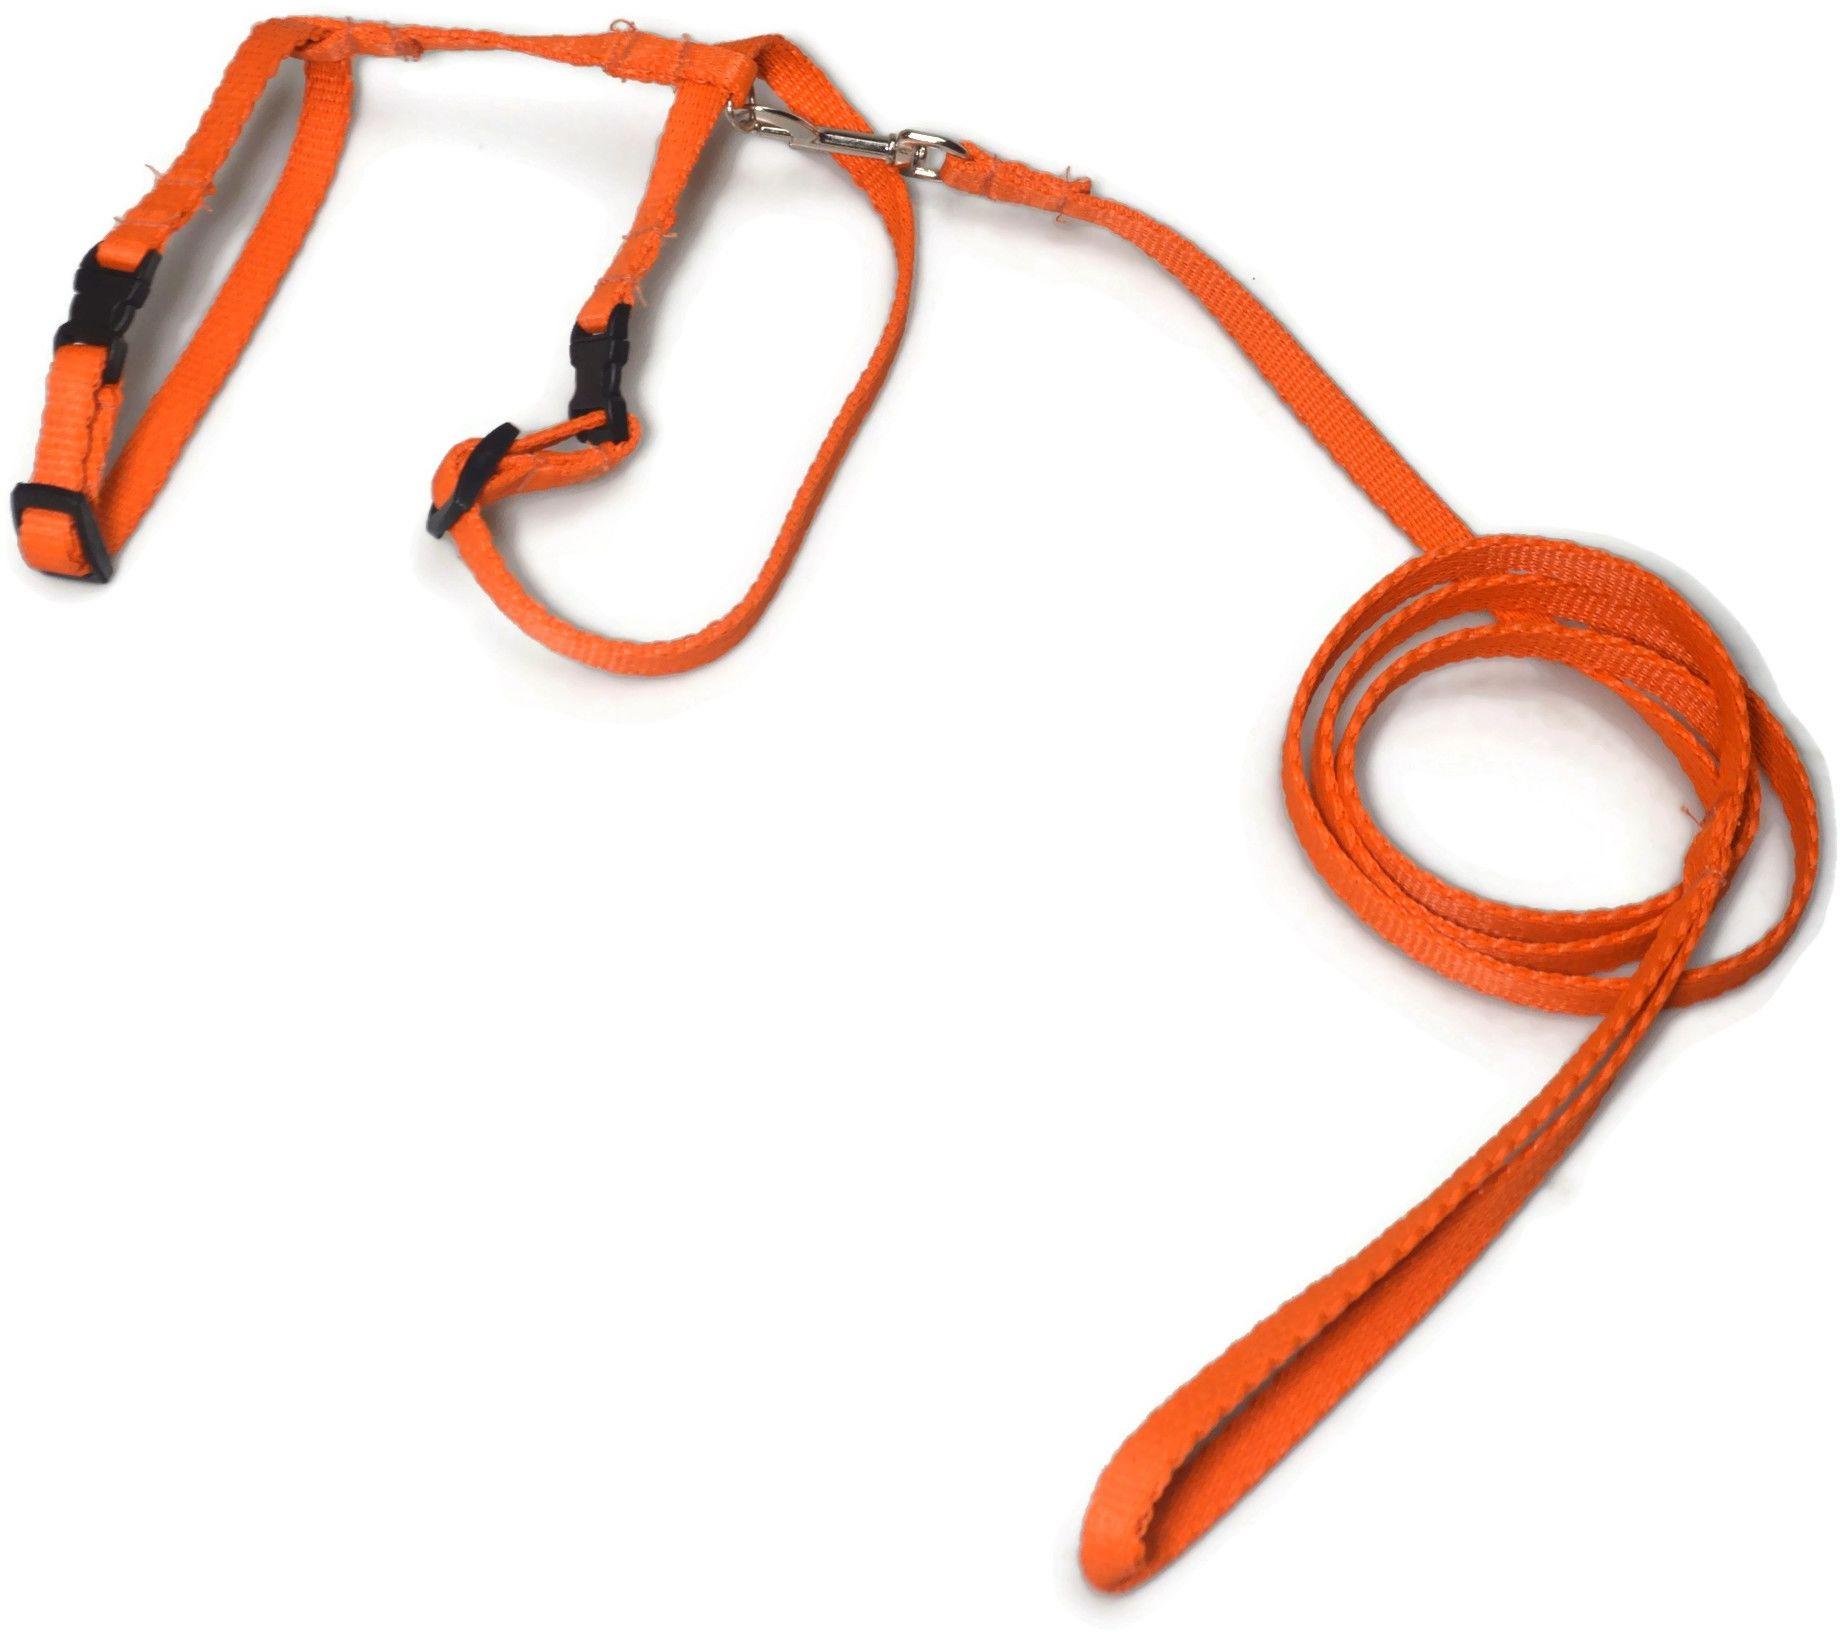 A-058 KOMPLET DLA KOTA V.1 : Kolor - Pomarańczowy - ALIZOO